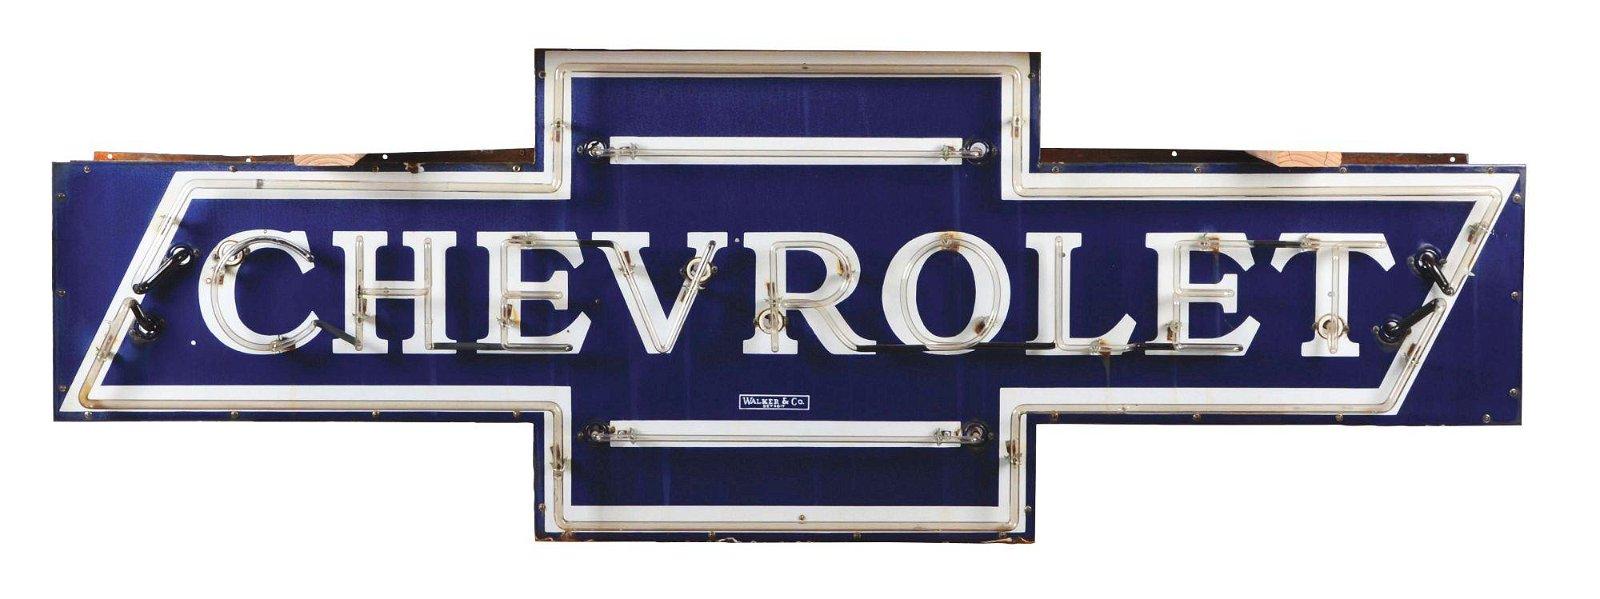 Chevrolet Motor Cars Porcelain Bow Tie Neon Dealership